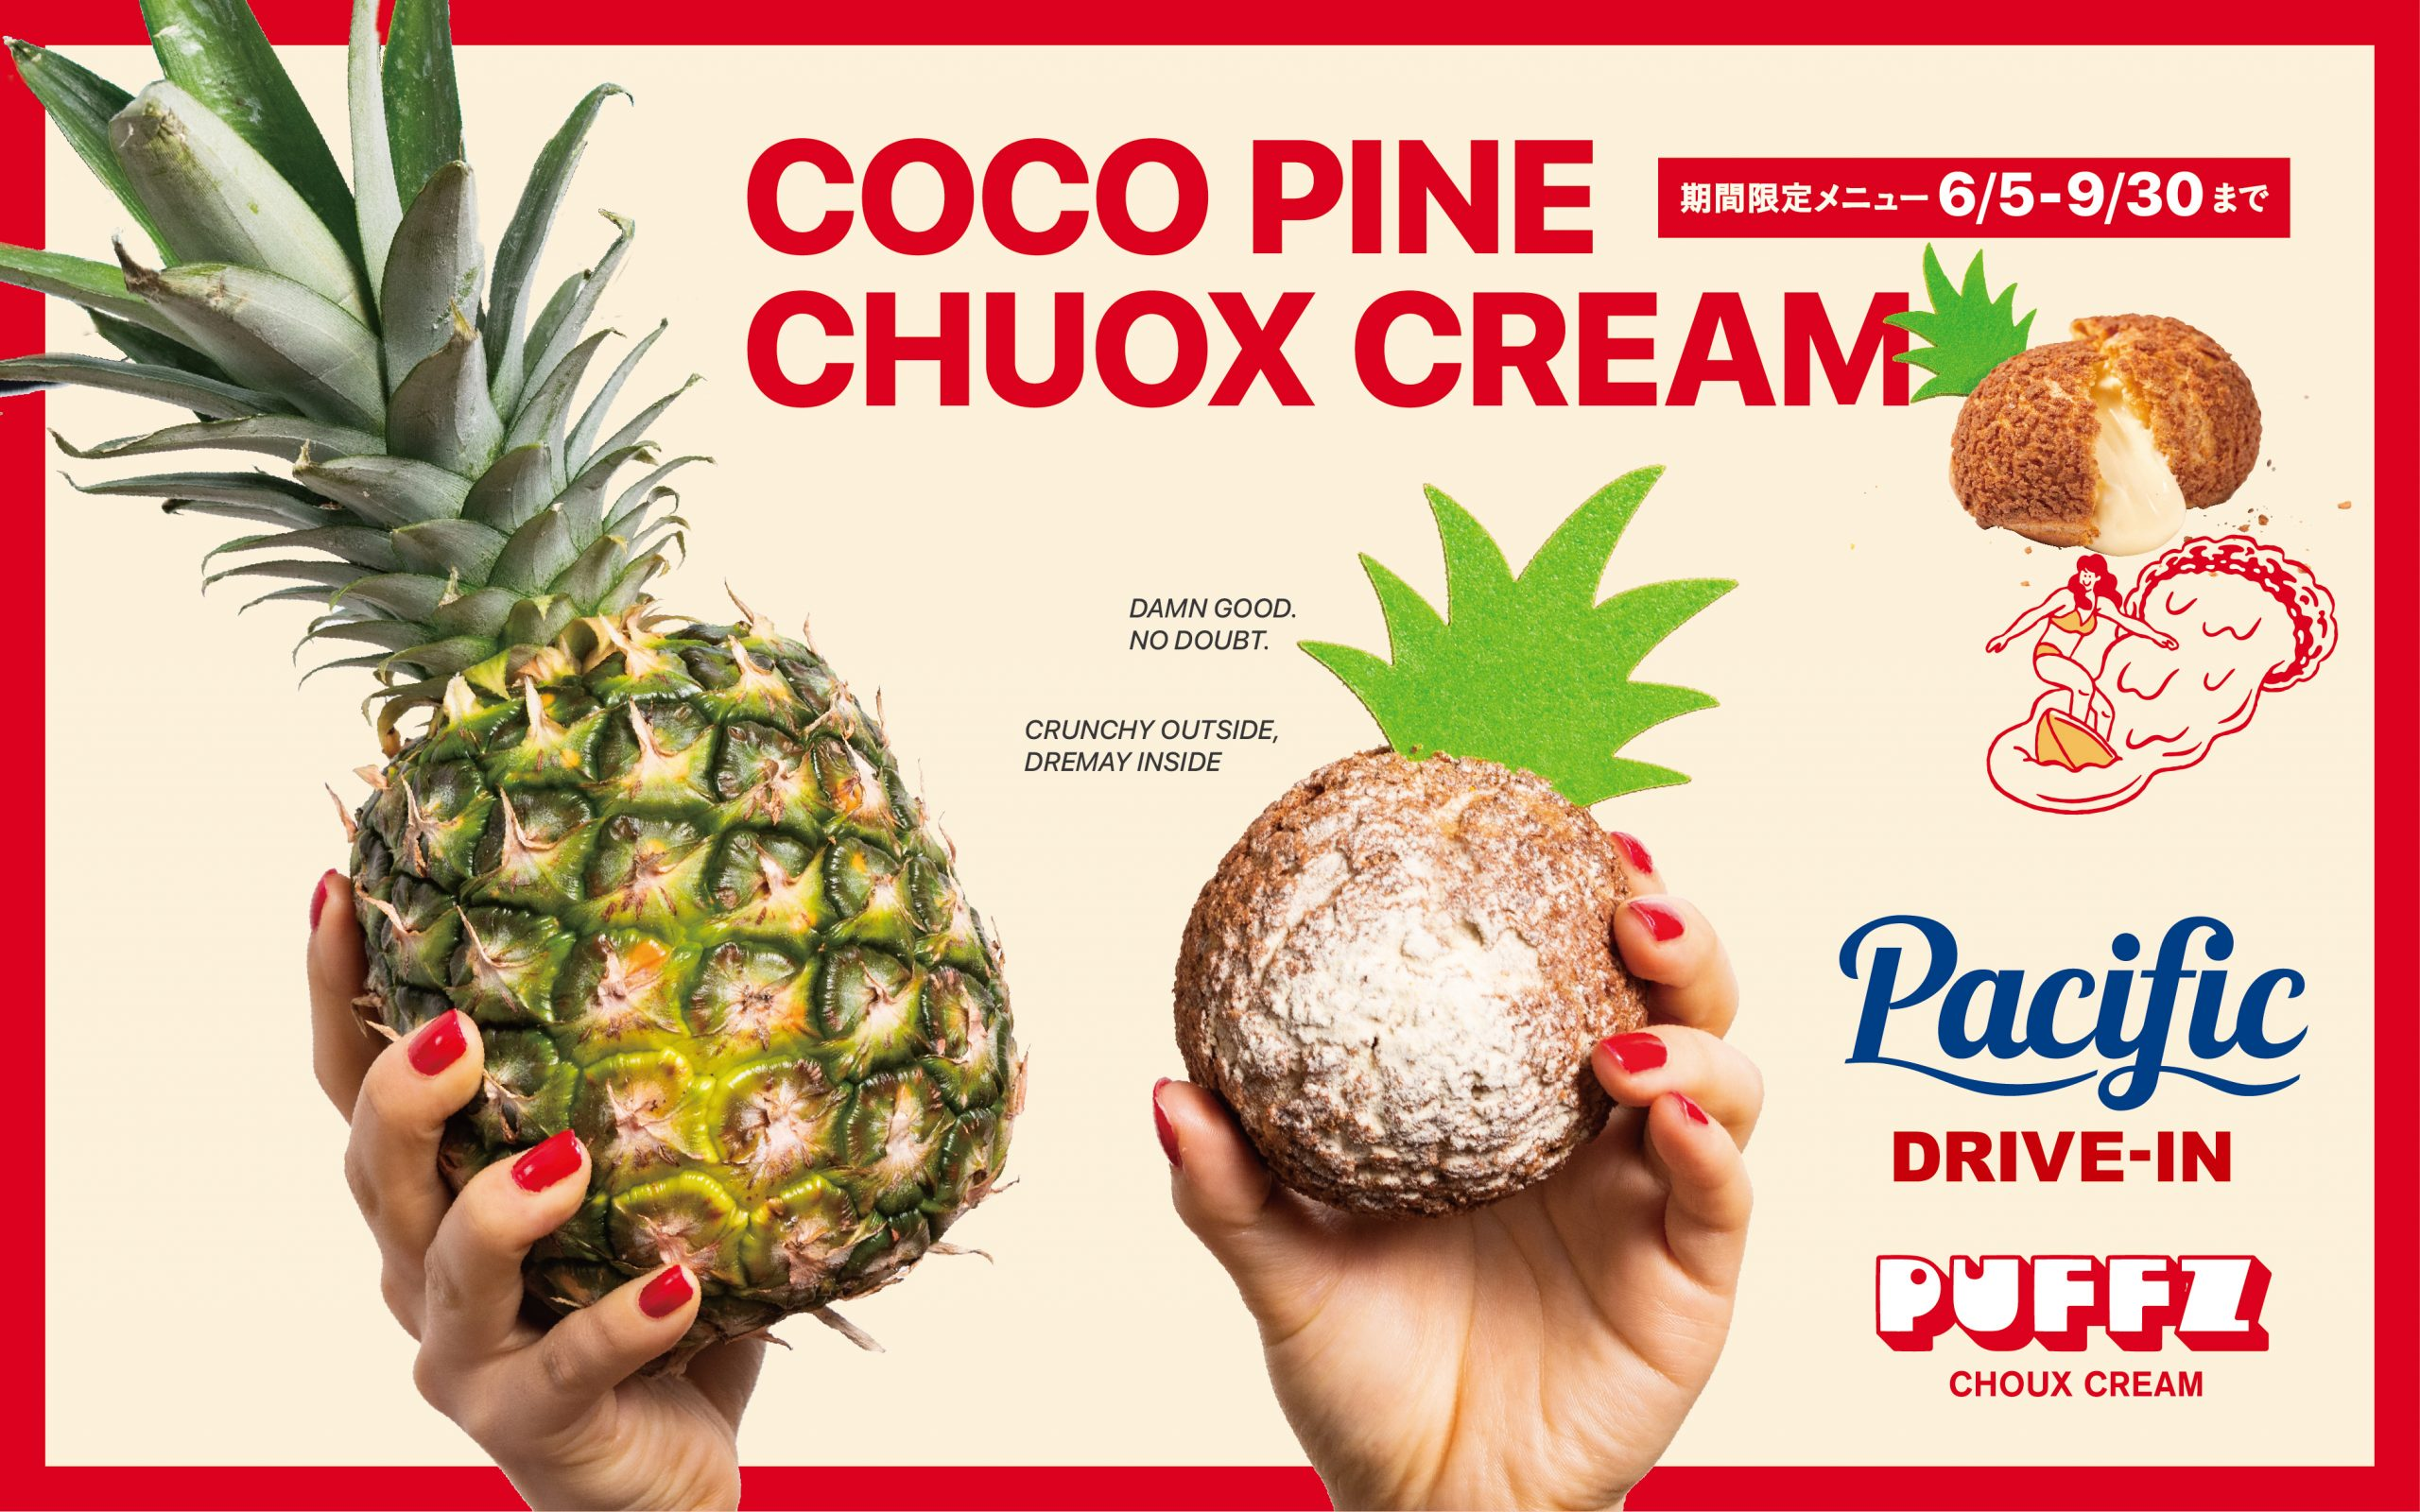 PUFFZ×PACIFIC DRIVE-INのコラボレーションが決定!パイナップルをイメージした限定シュークリームを期間限定で販売!